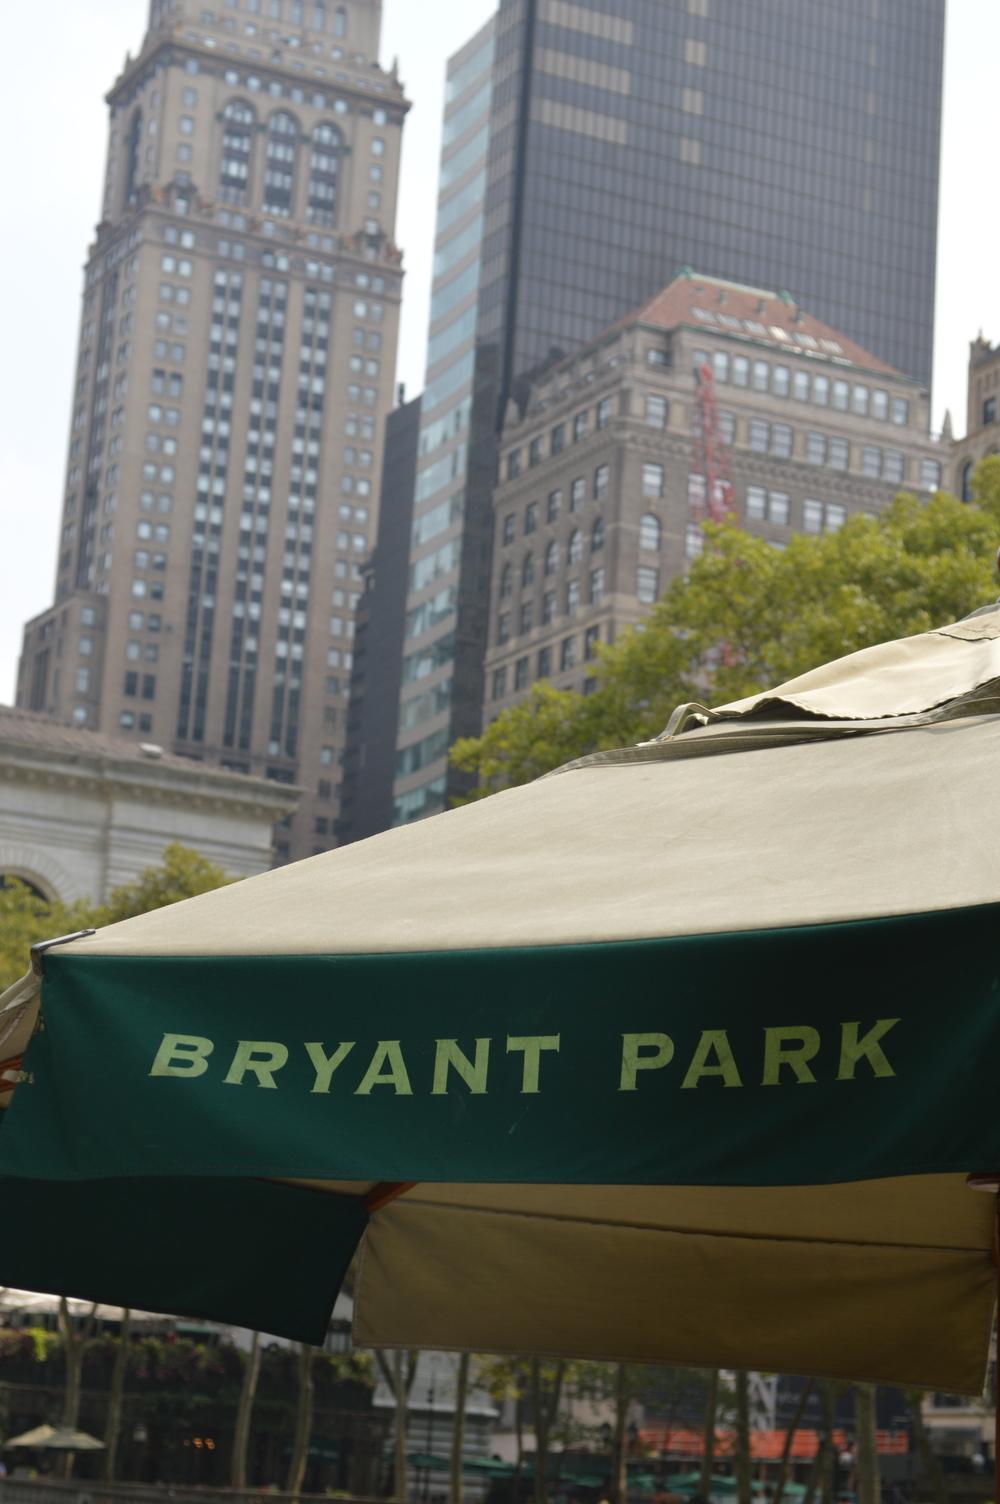 BryantPark-NYC-LaurenSchwaiger-Life-Style-Travel-Blog.jpg